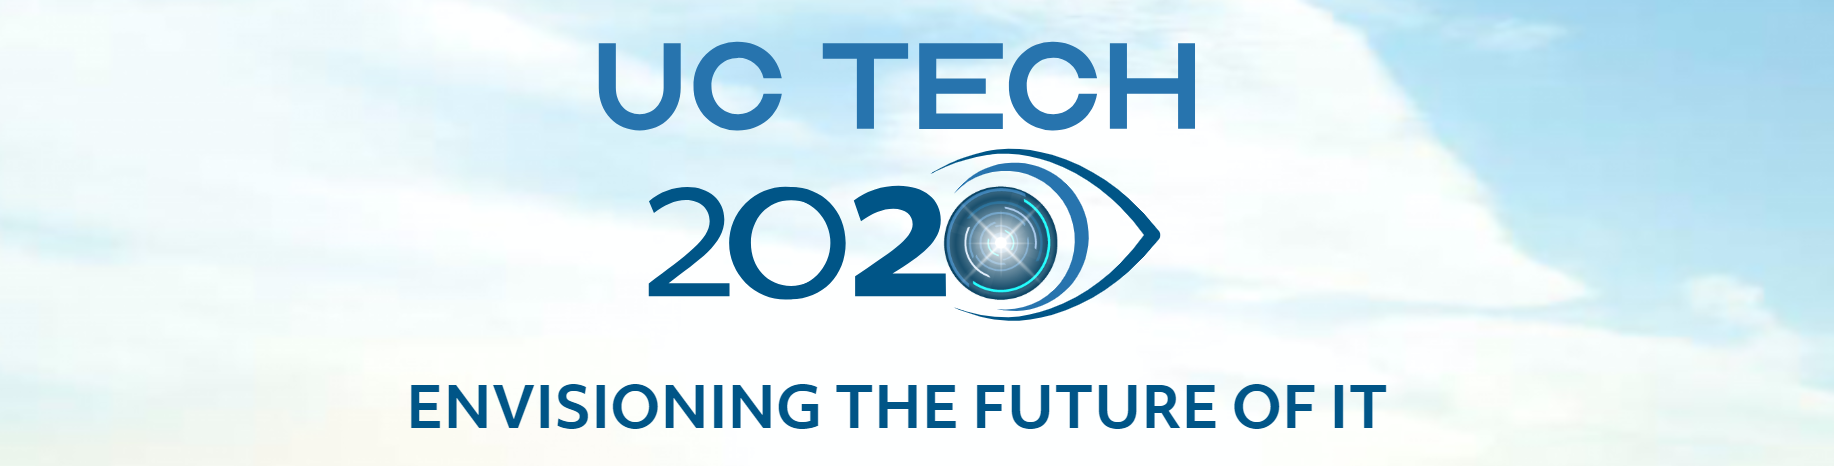 UT Tech 2020 header